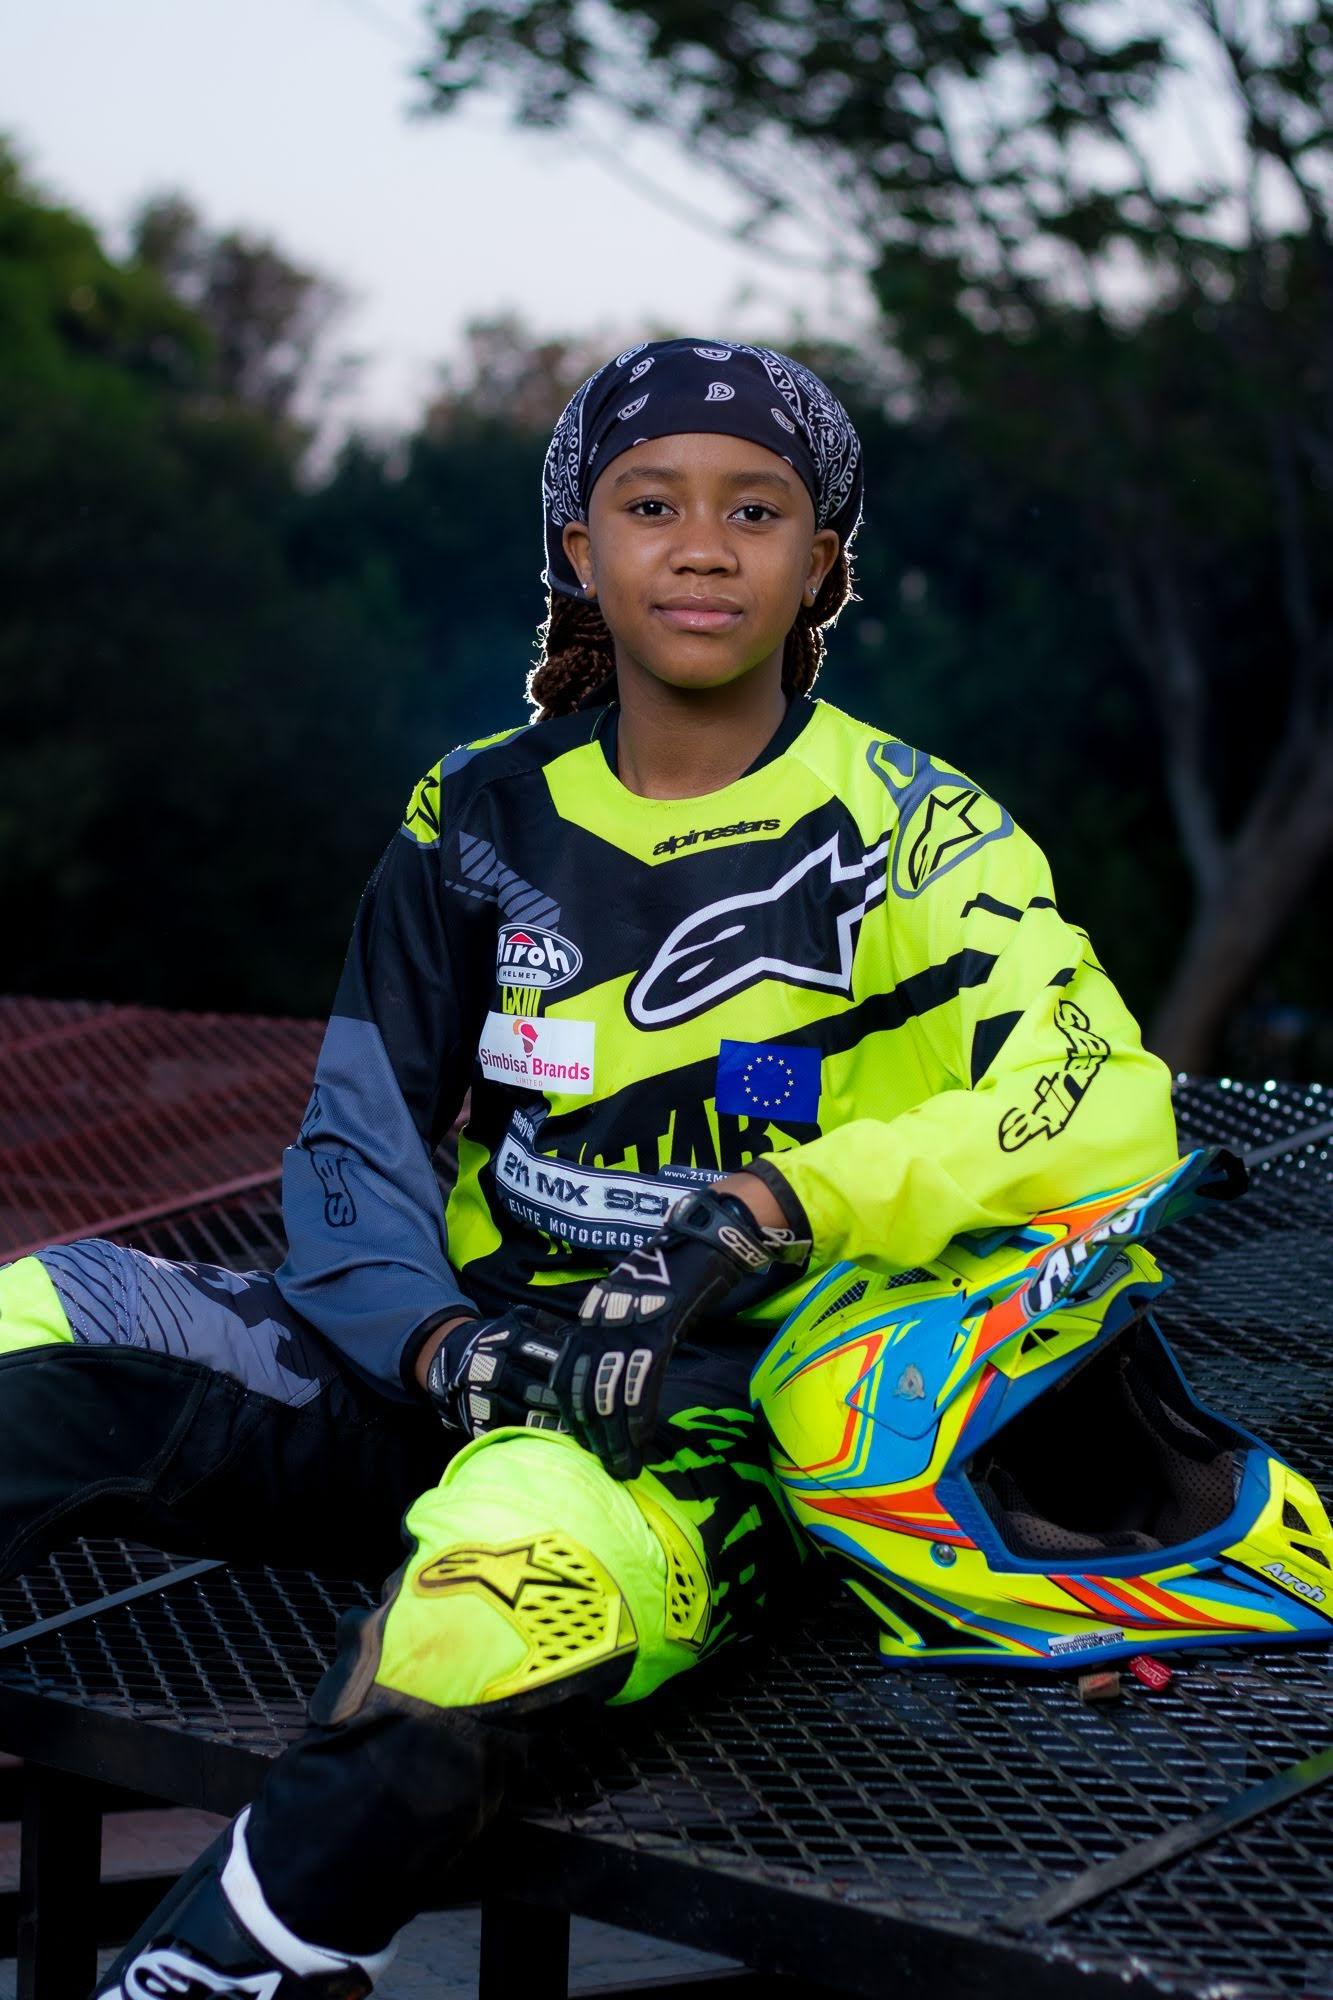 Tanya Muzinda breaking barriers in motocross